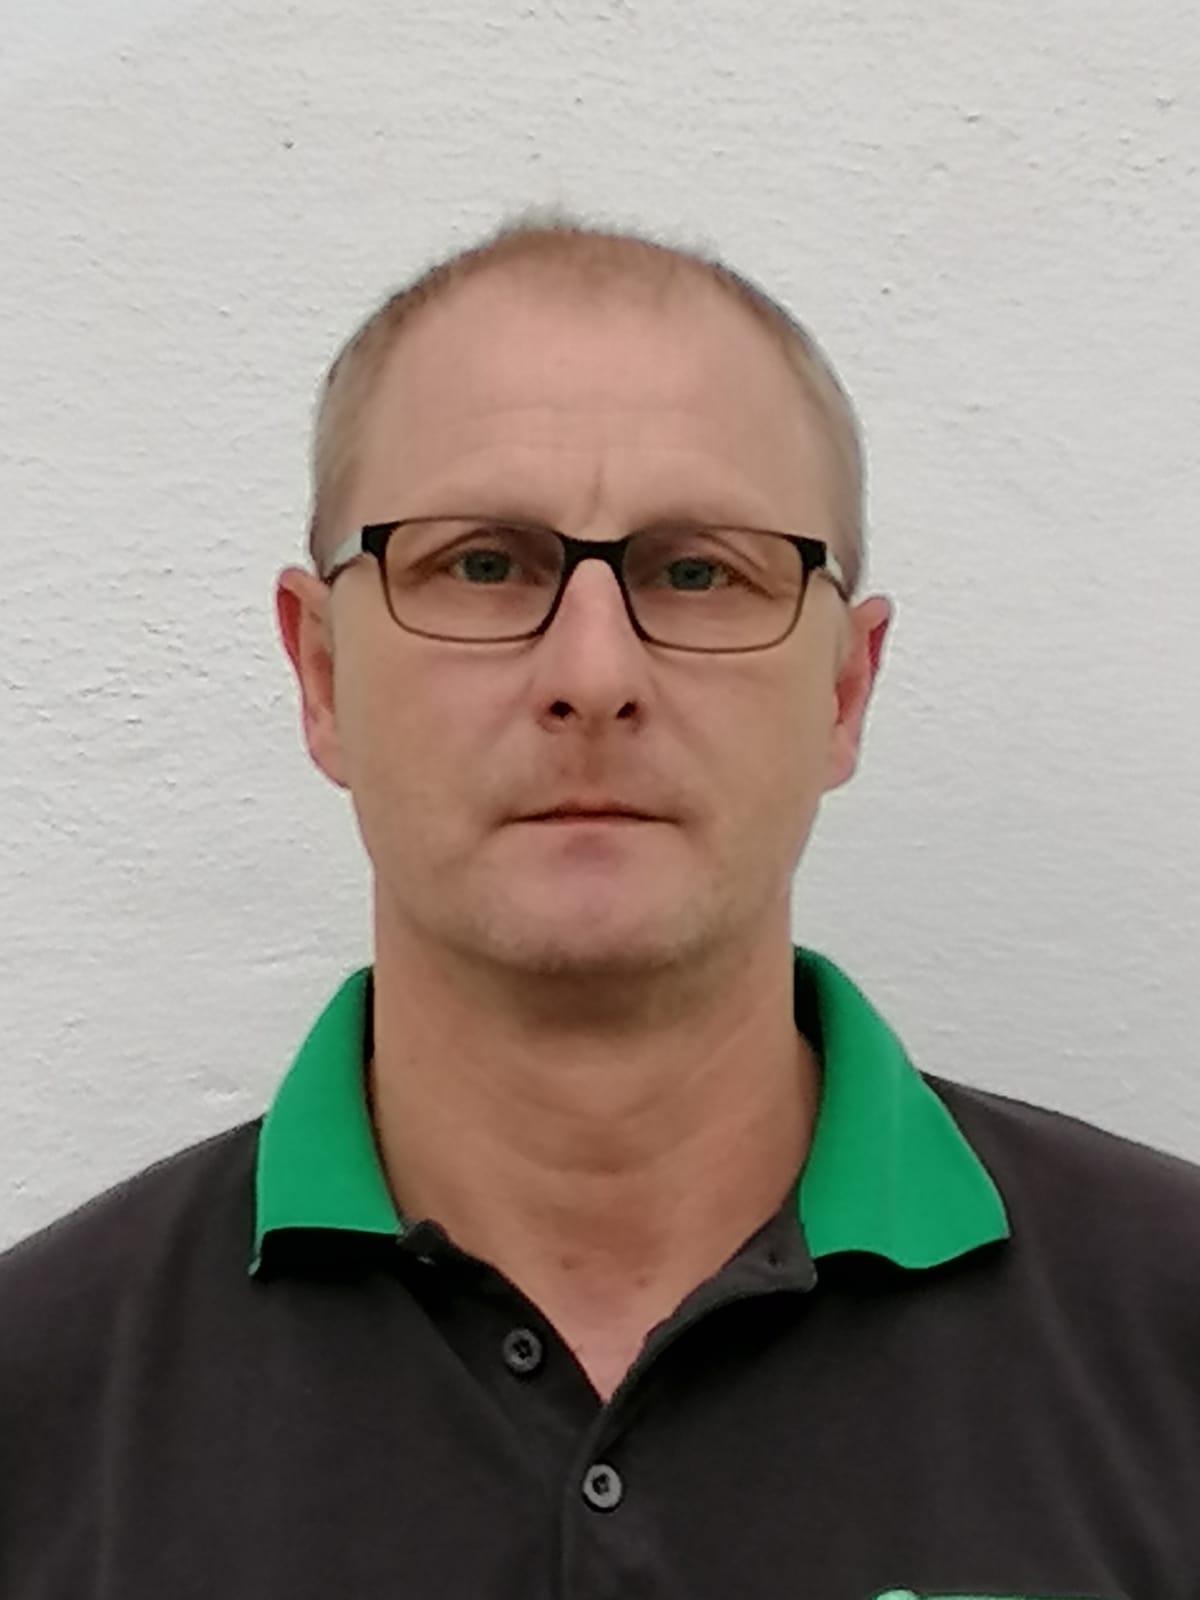 Heino Mewes